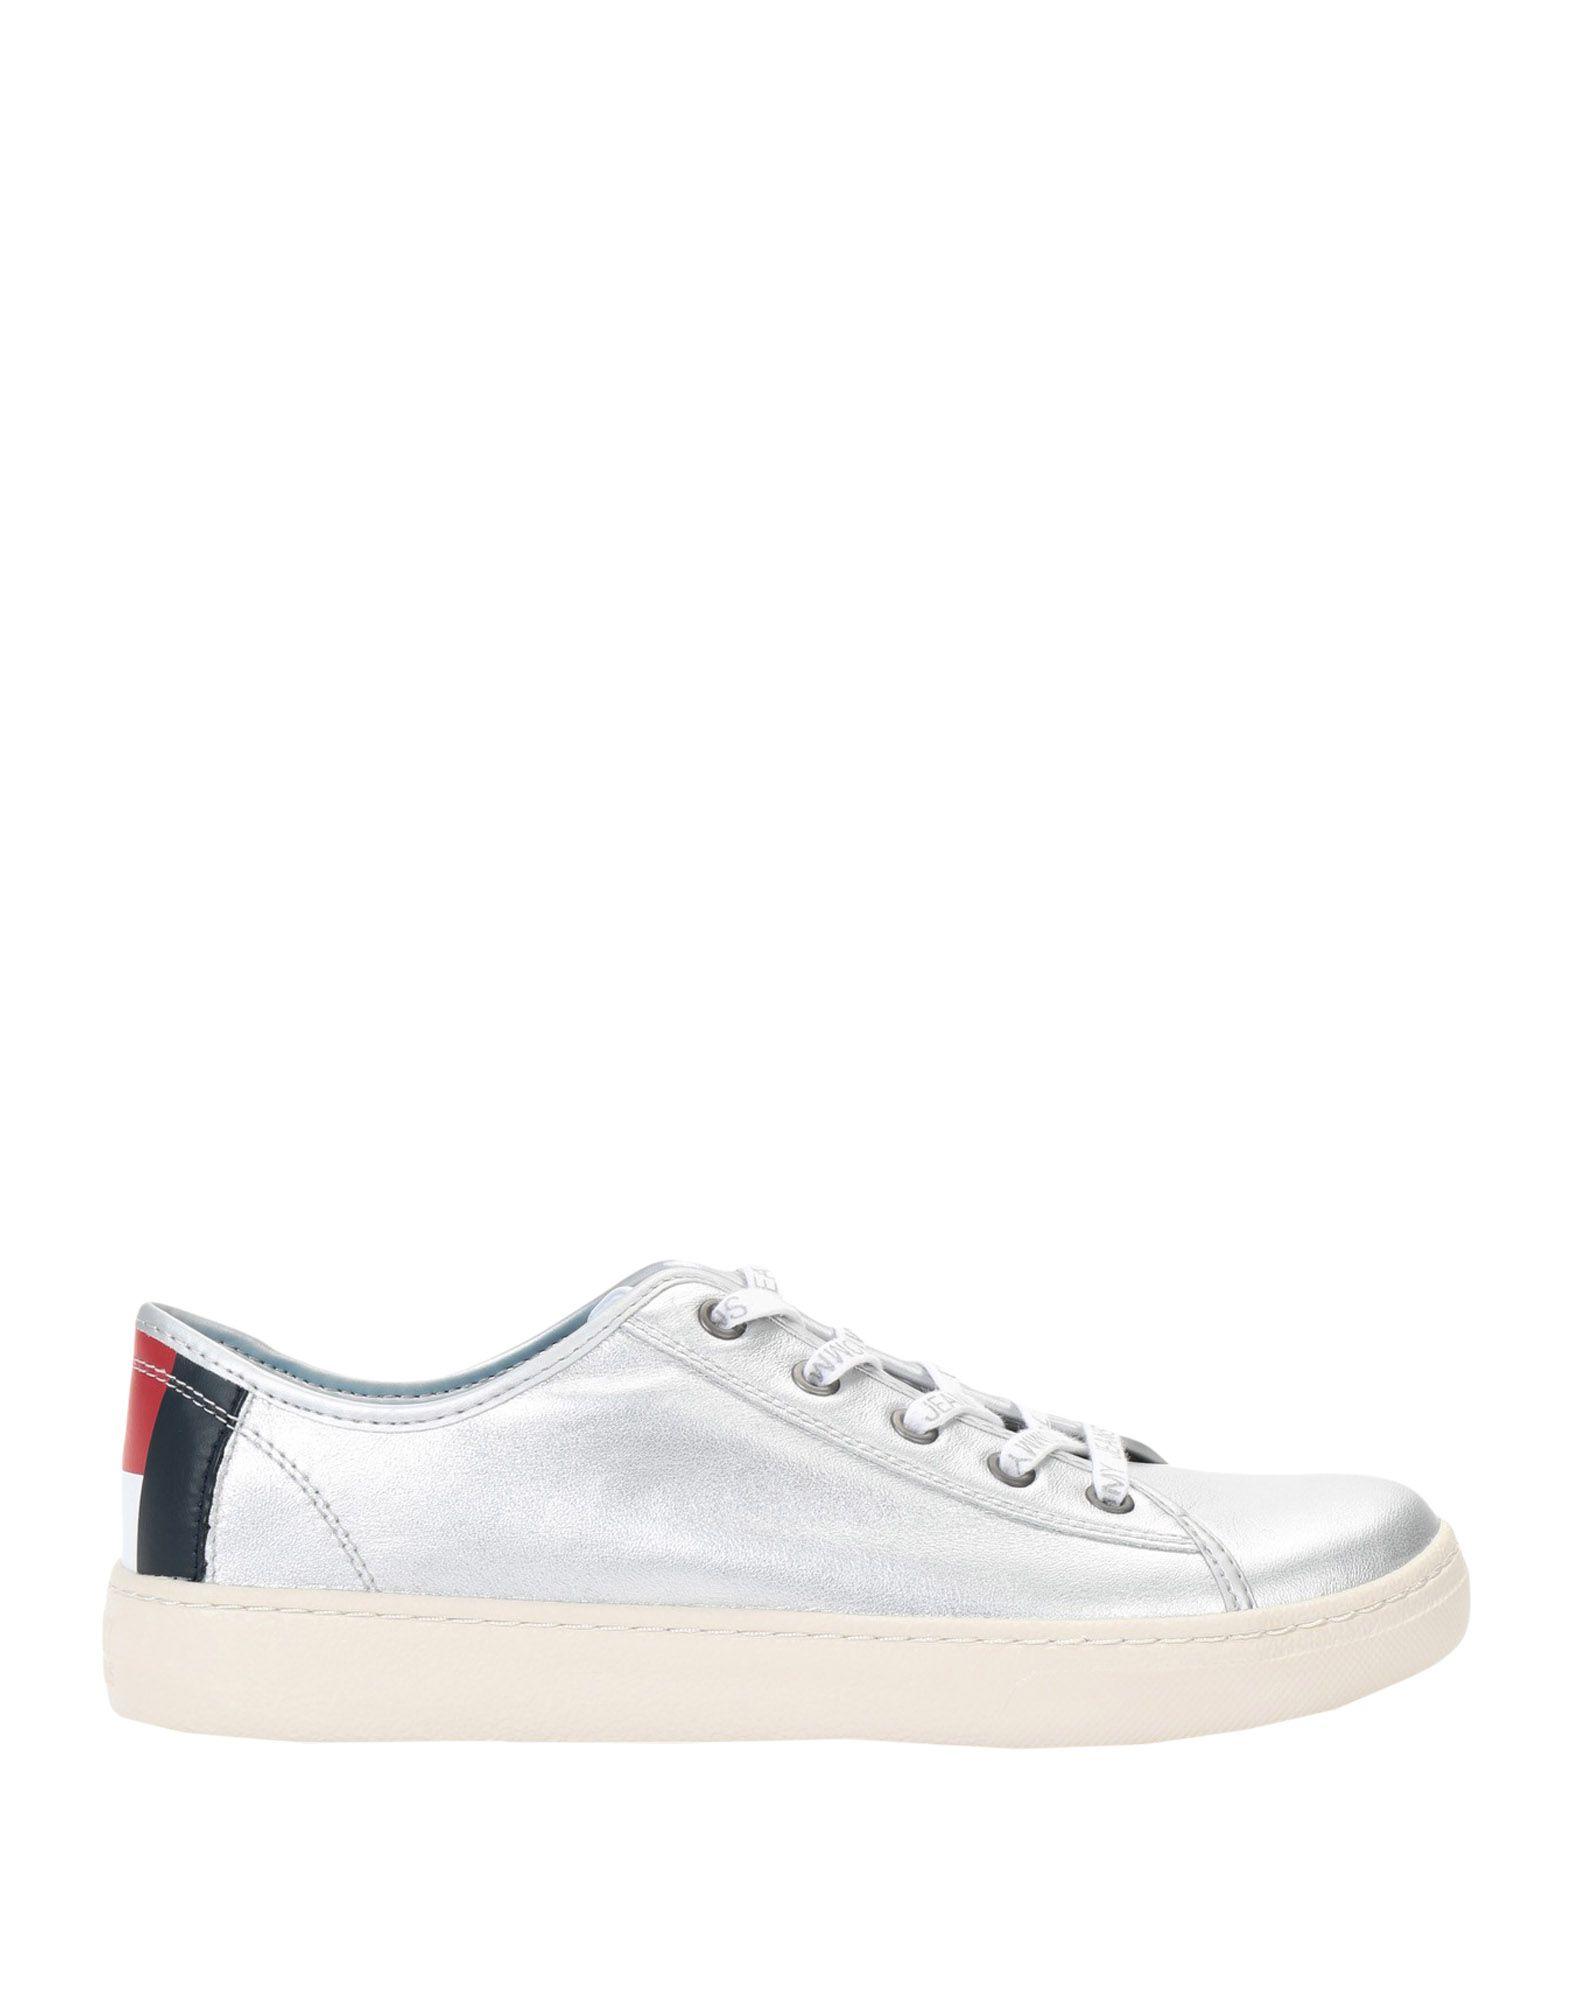 Tommy 11539733HW Jeans Tommy Jeans Light Leather Low  11539733HW Tommy Gute Qualität beliebte Schuhe 1bf26e